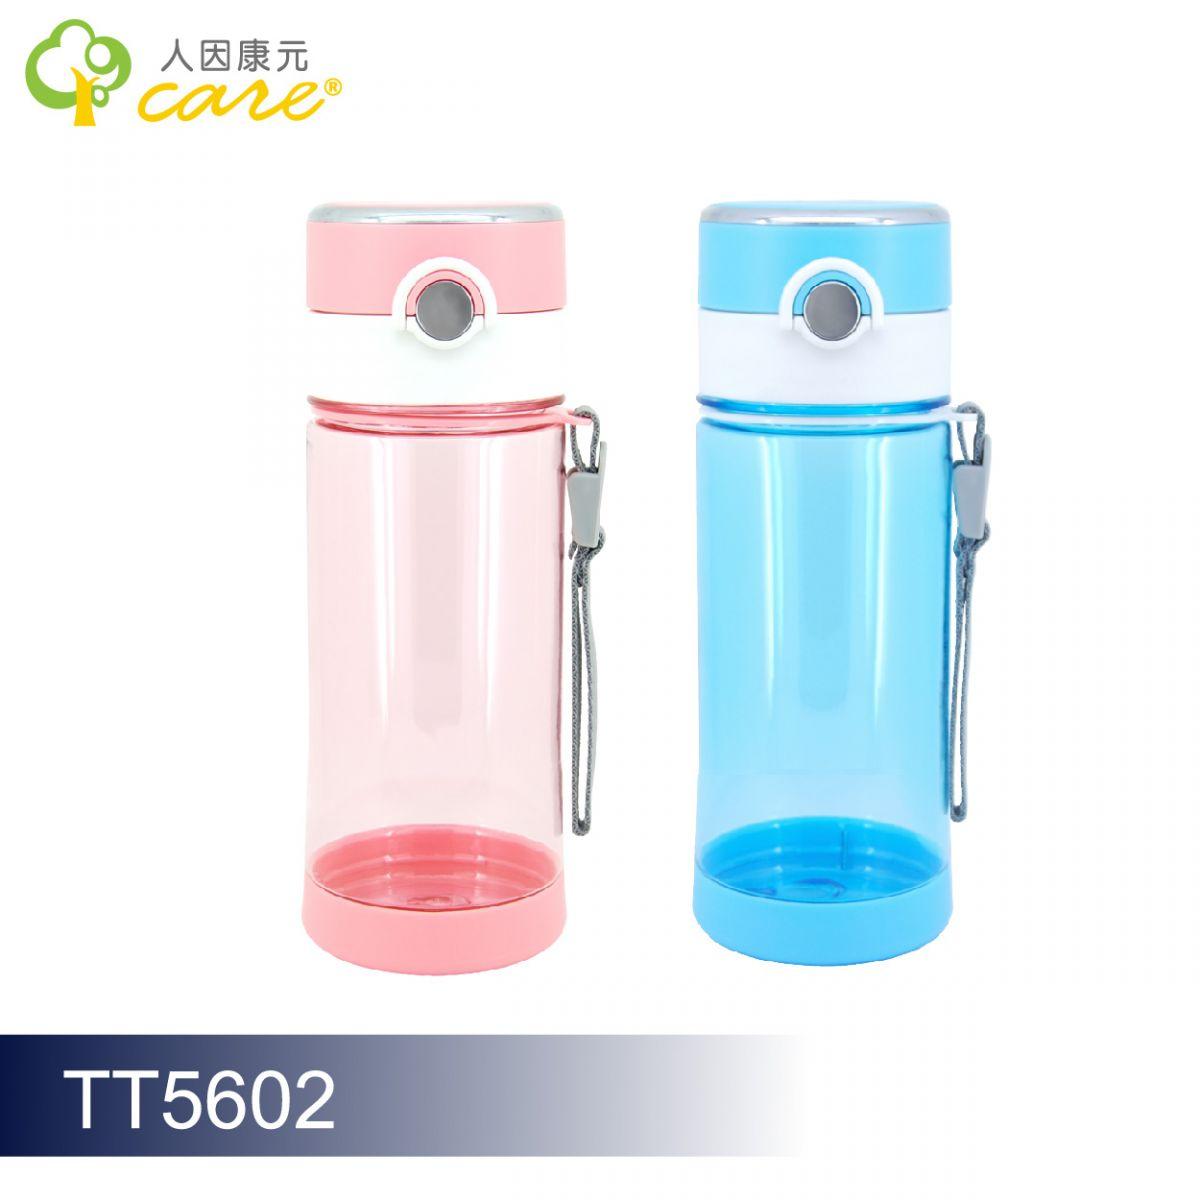 【ErgoCare】新負離子能量冷熱水壺 TT5602P 櫻花粉 560ml